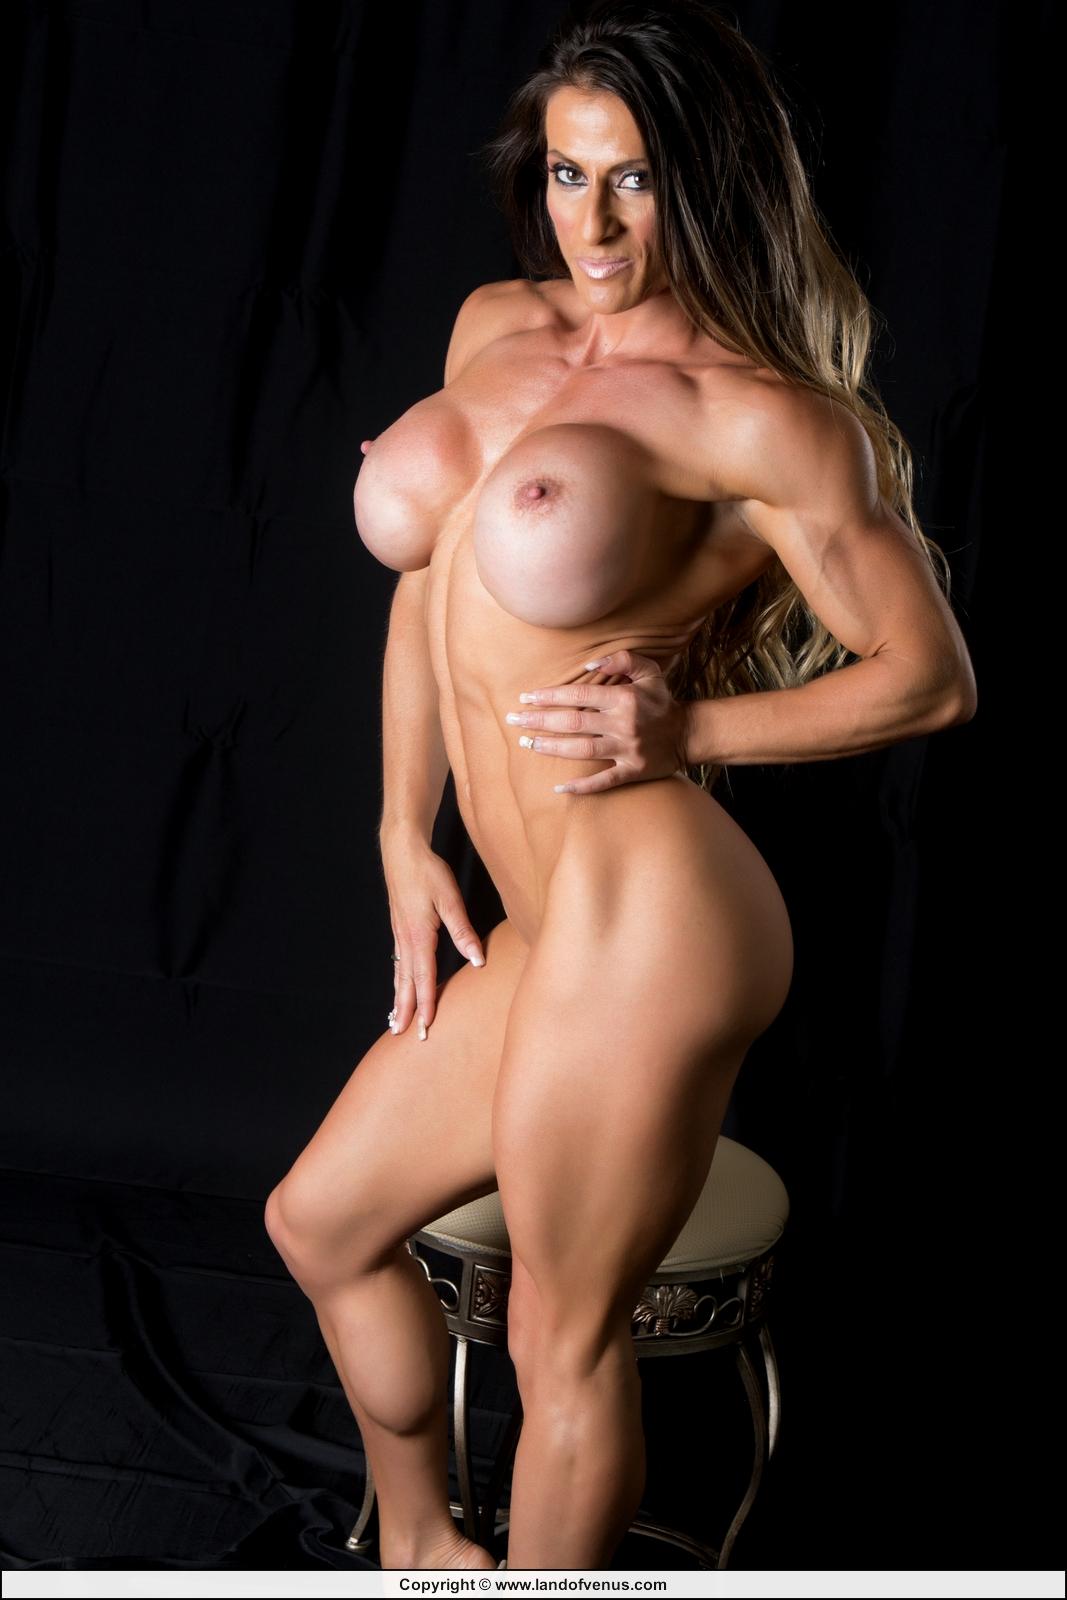 Nude female muscle sheila rocks nude photo